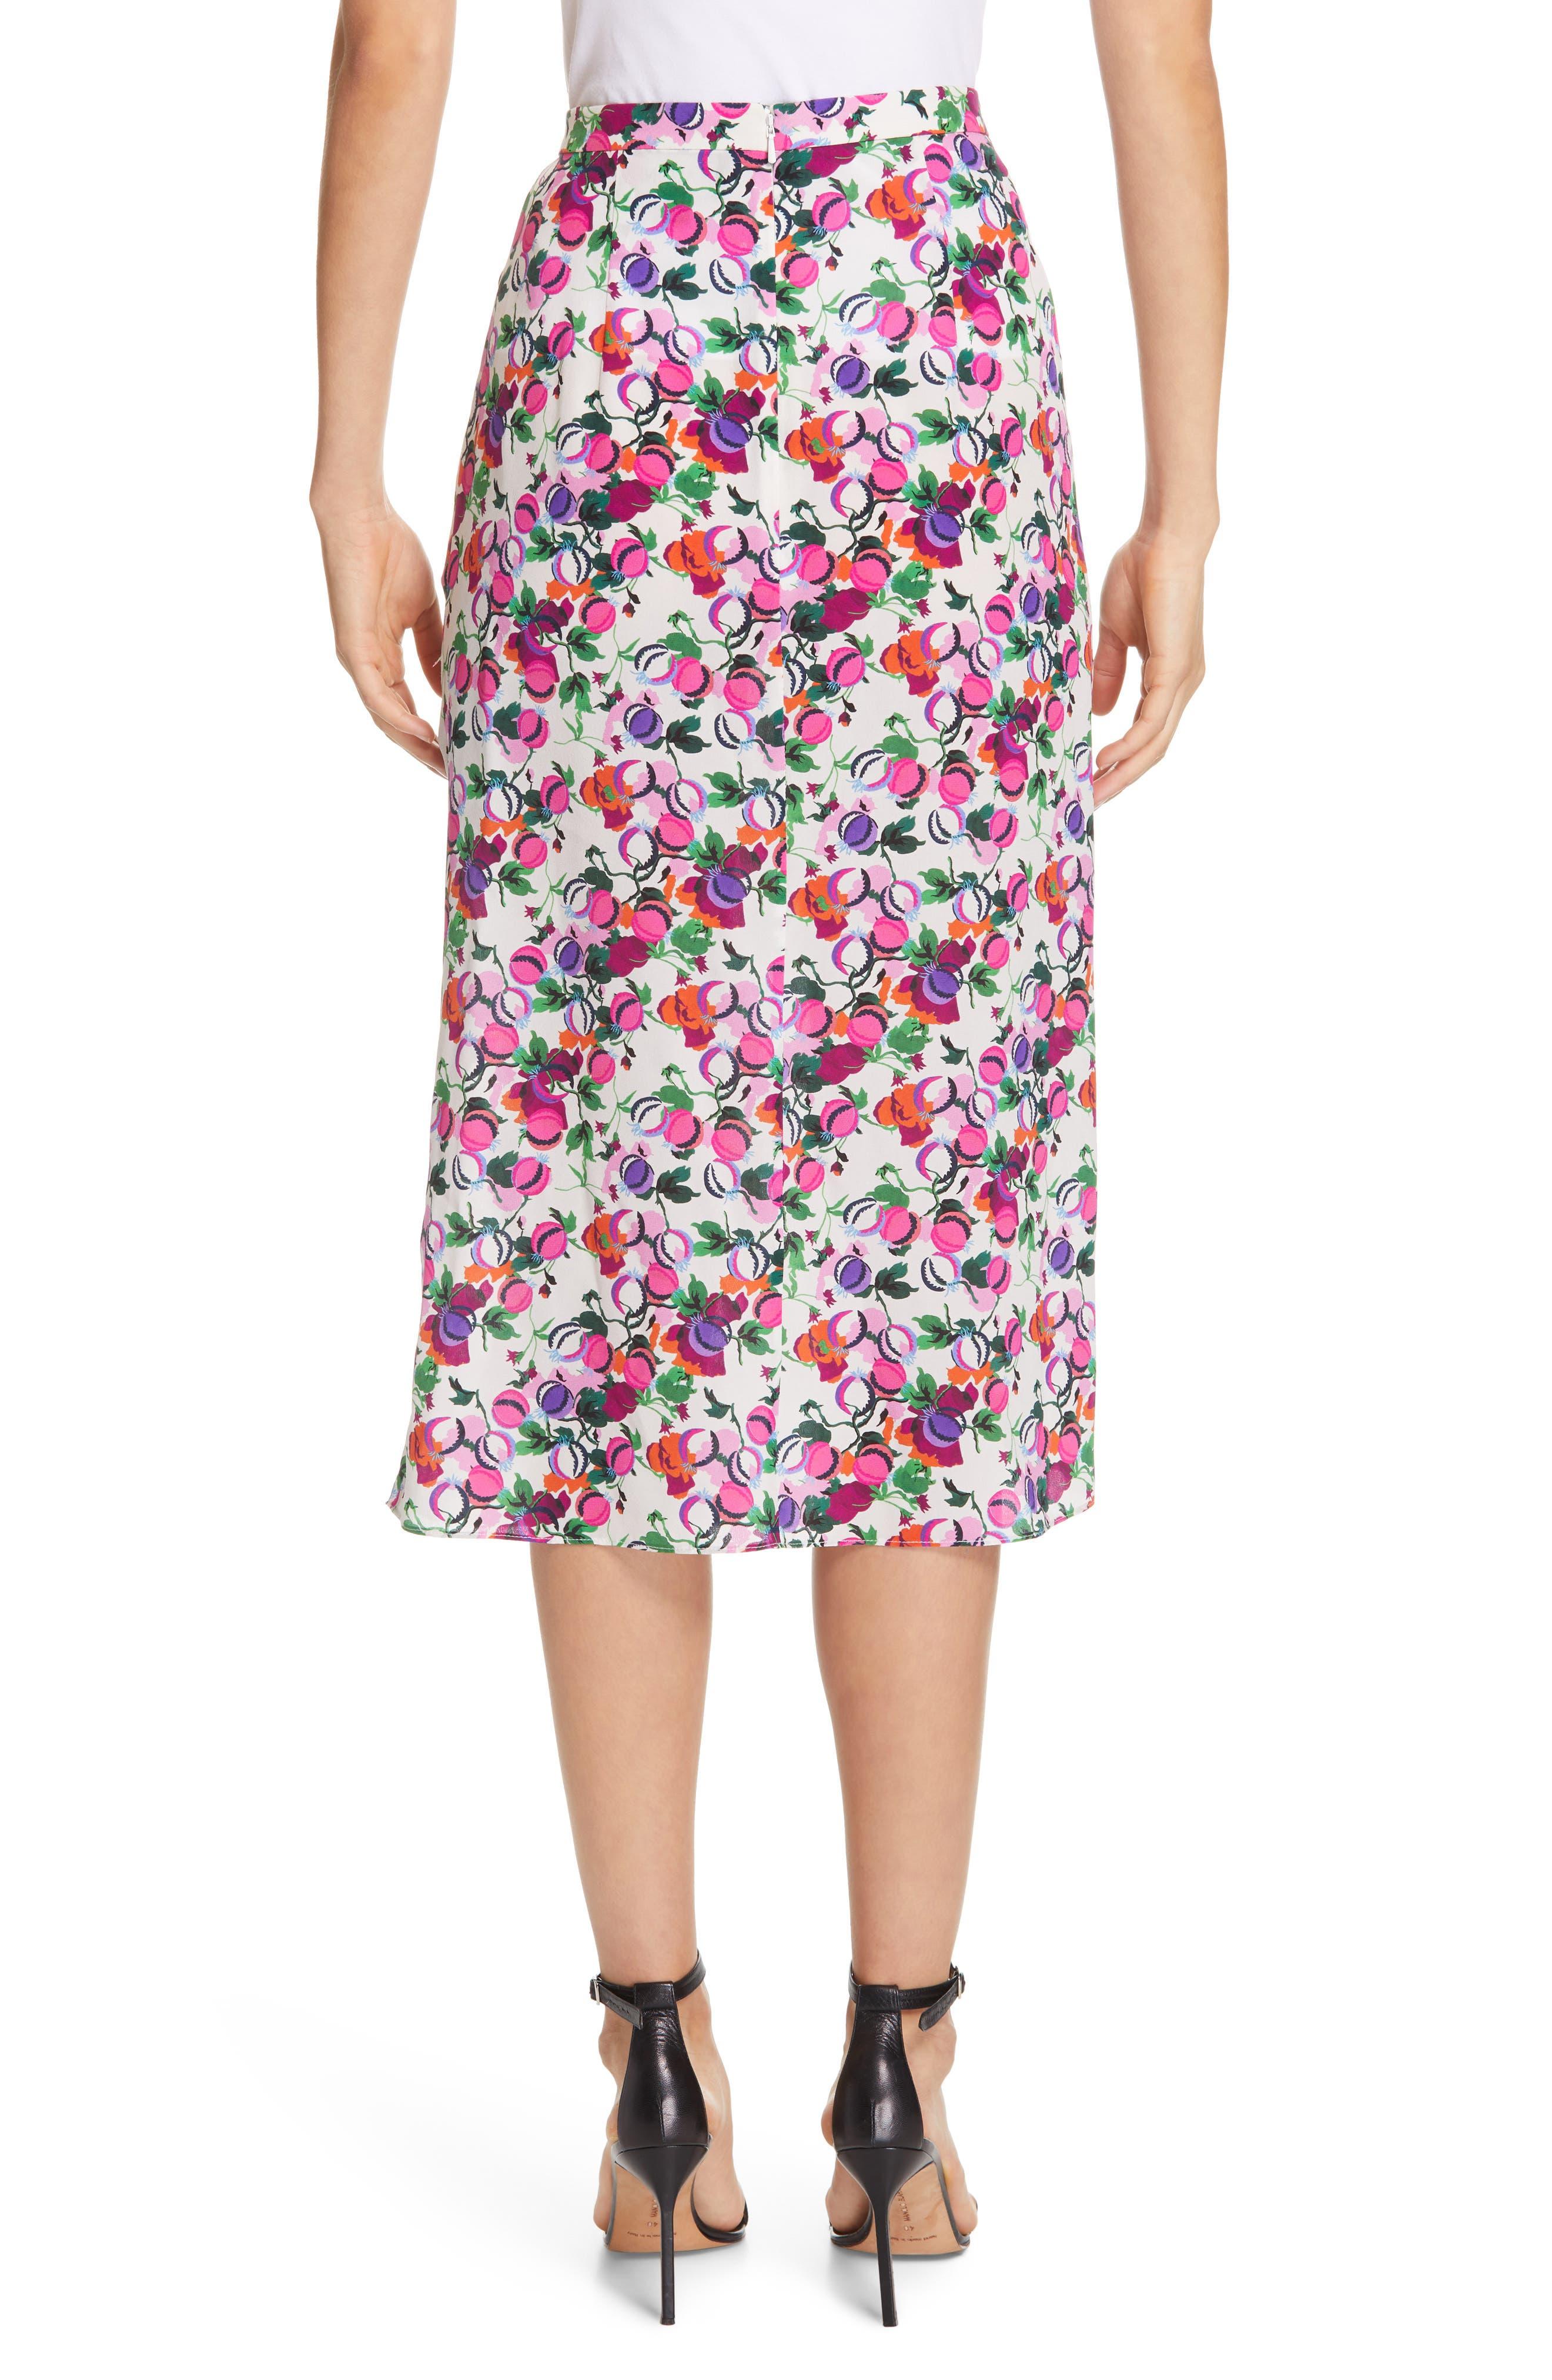 SALONI, Kelly Floral Print Silk Skirt, Alternate thumbnail 2, color, ROSE BOUNTY